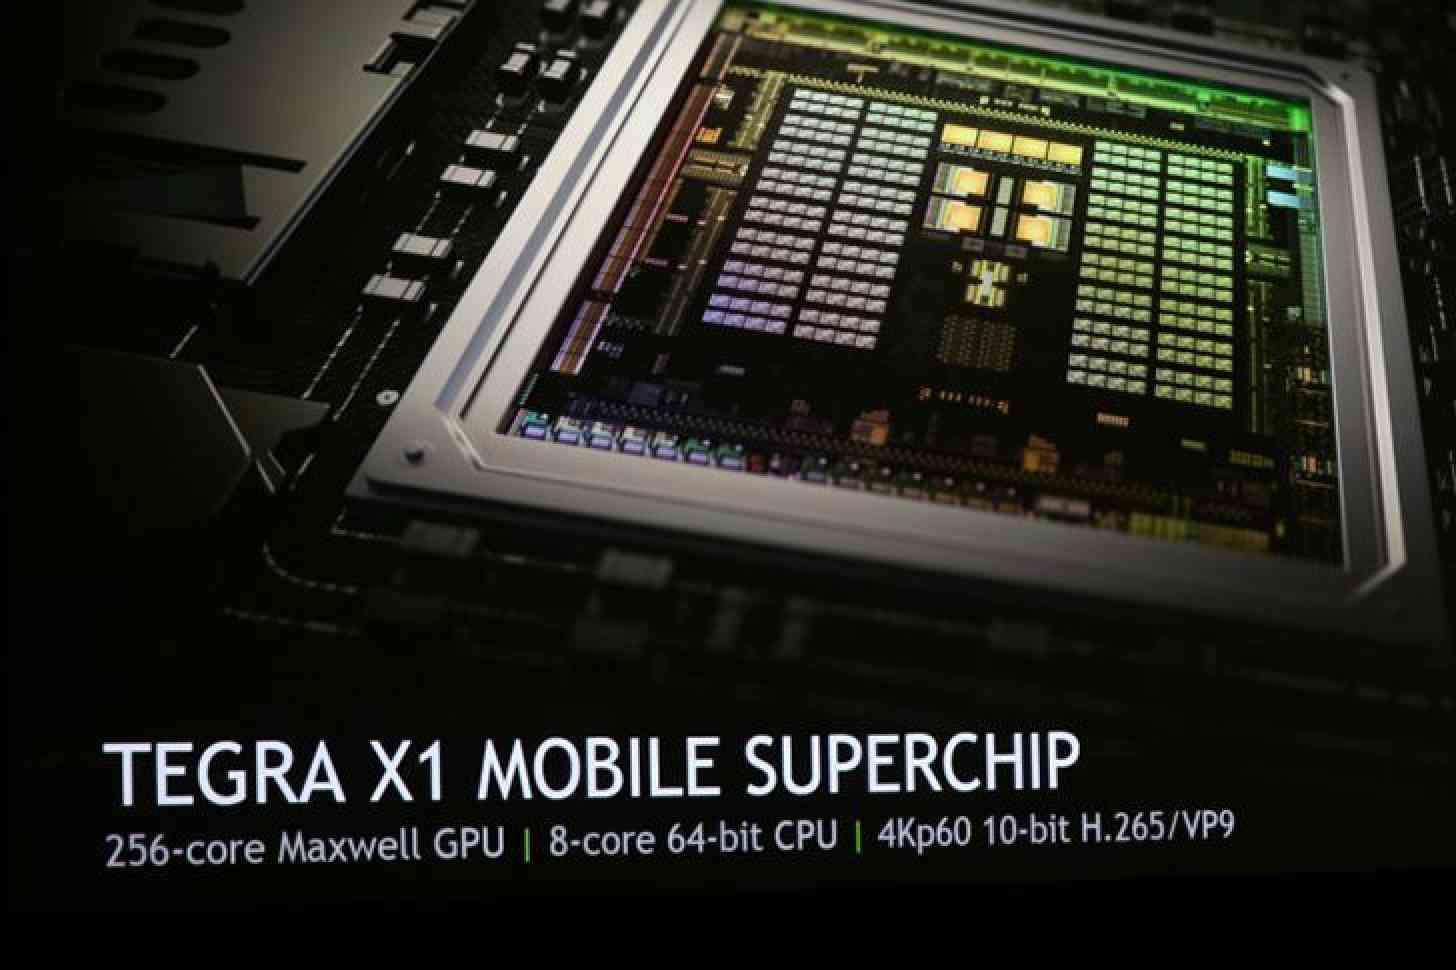 NVIDIA Tegra X1 mobile superchip CES 2015